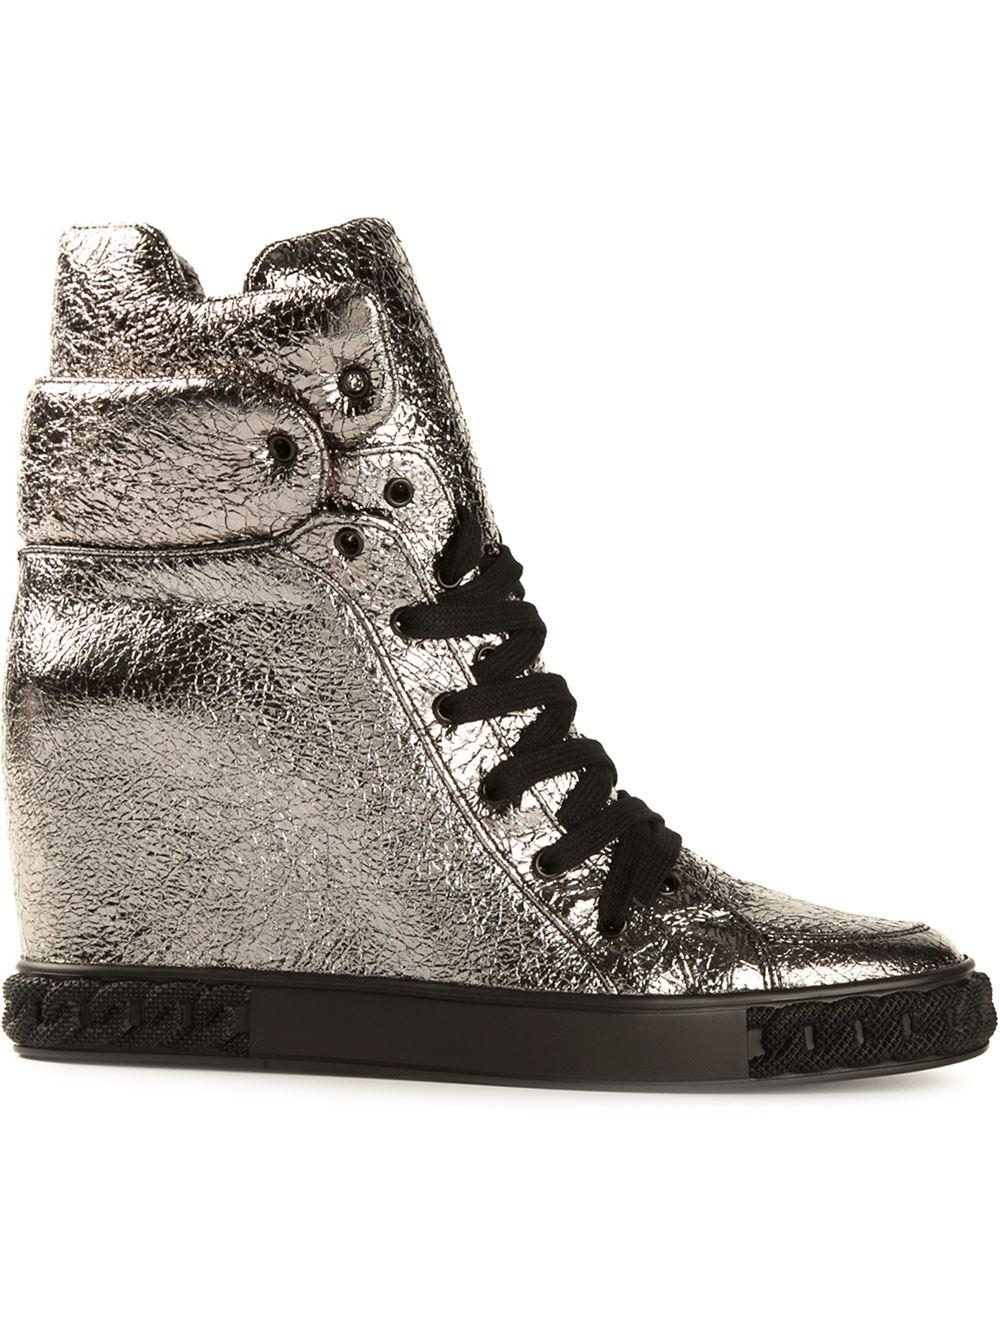 4c5e9c44e5c Lyst - Casadei Concealed Wedge Hightop Sneakers in Metallic